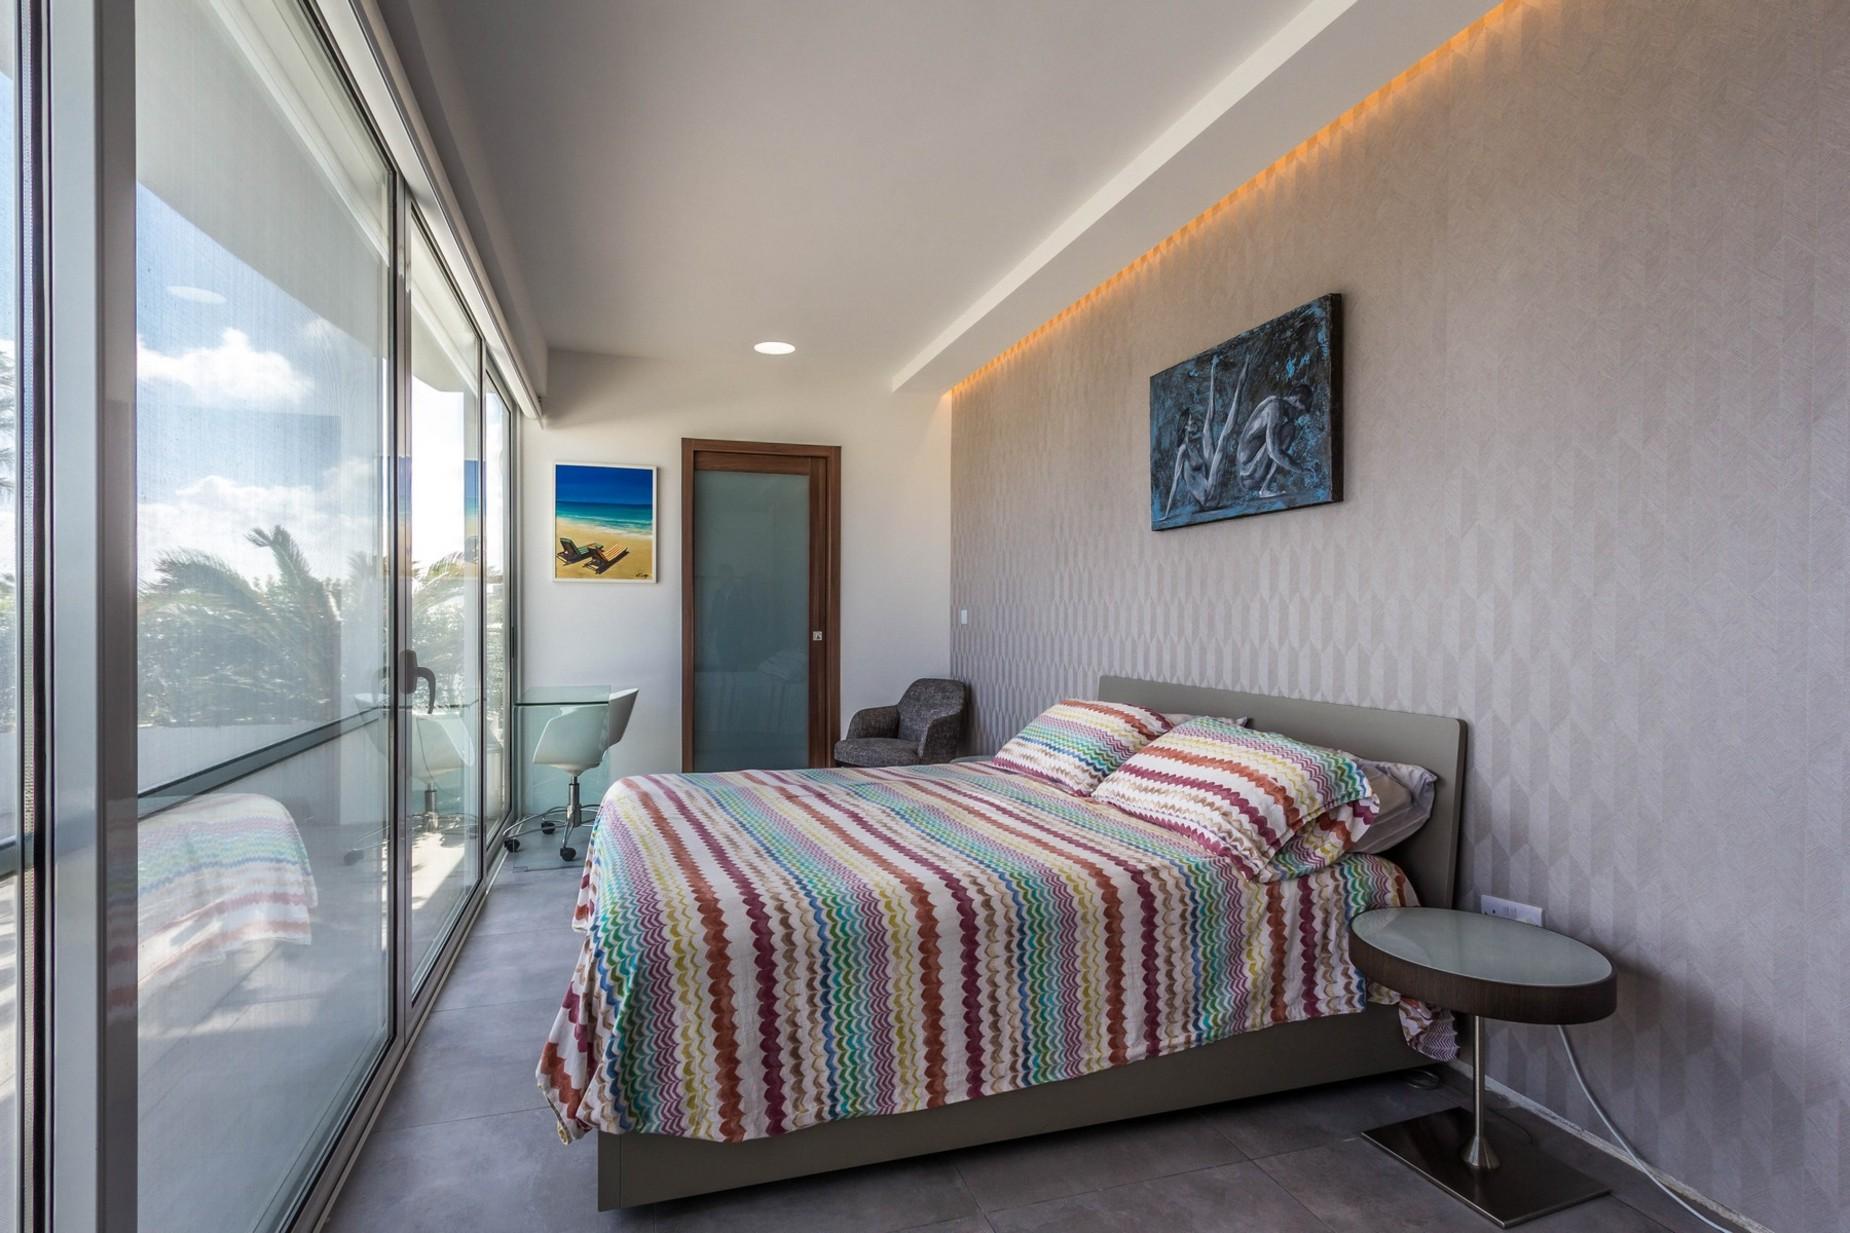 4 bed Villa For Sale in Marsascala, Marsascala - thumb 10